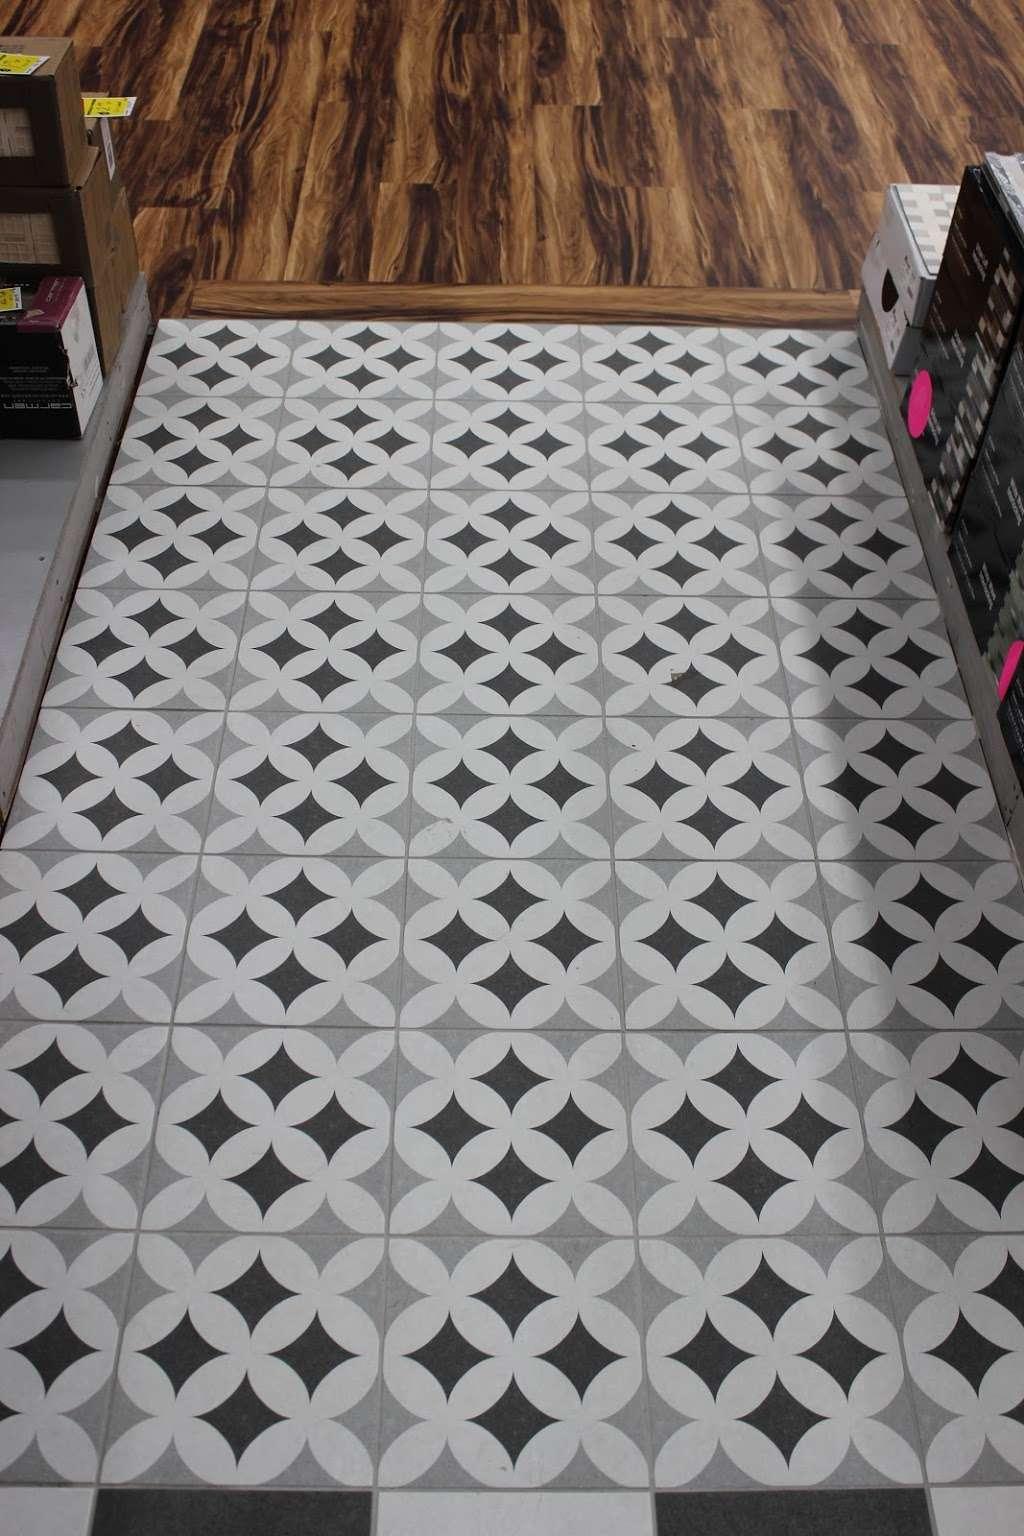 carpet tile mart 1410 kenneth rd